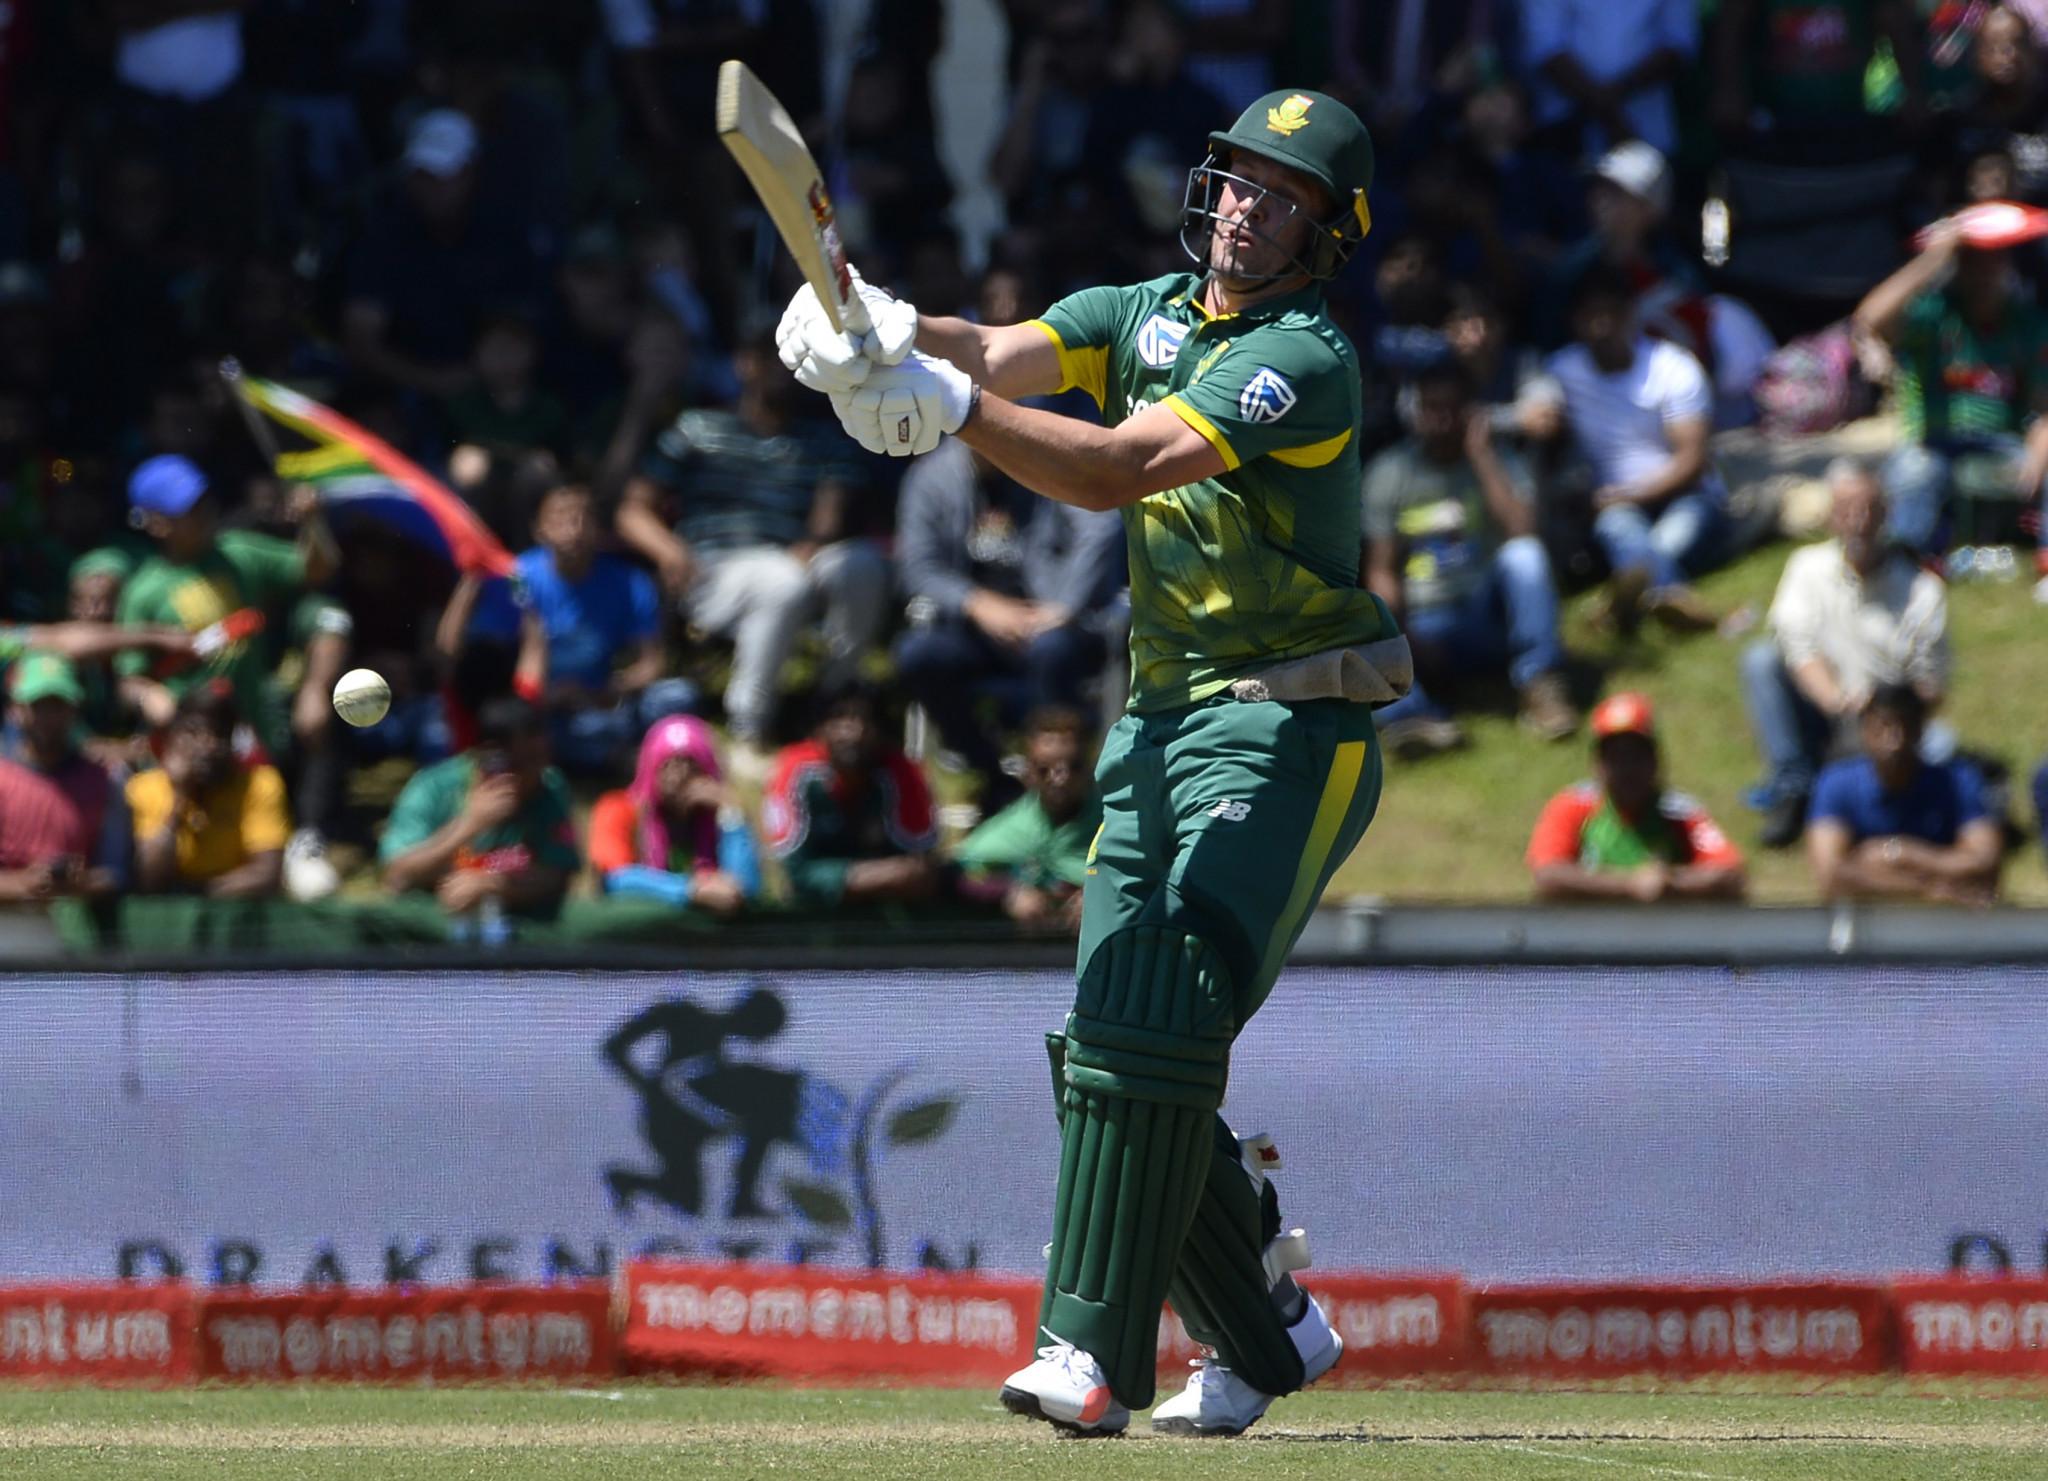 De Villiers returns to top of ICC ODI batting rankings